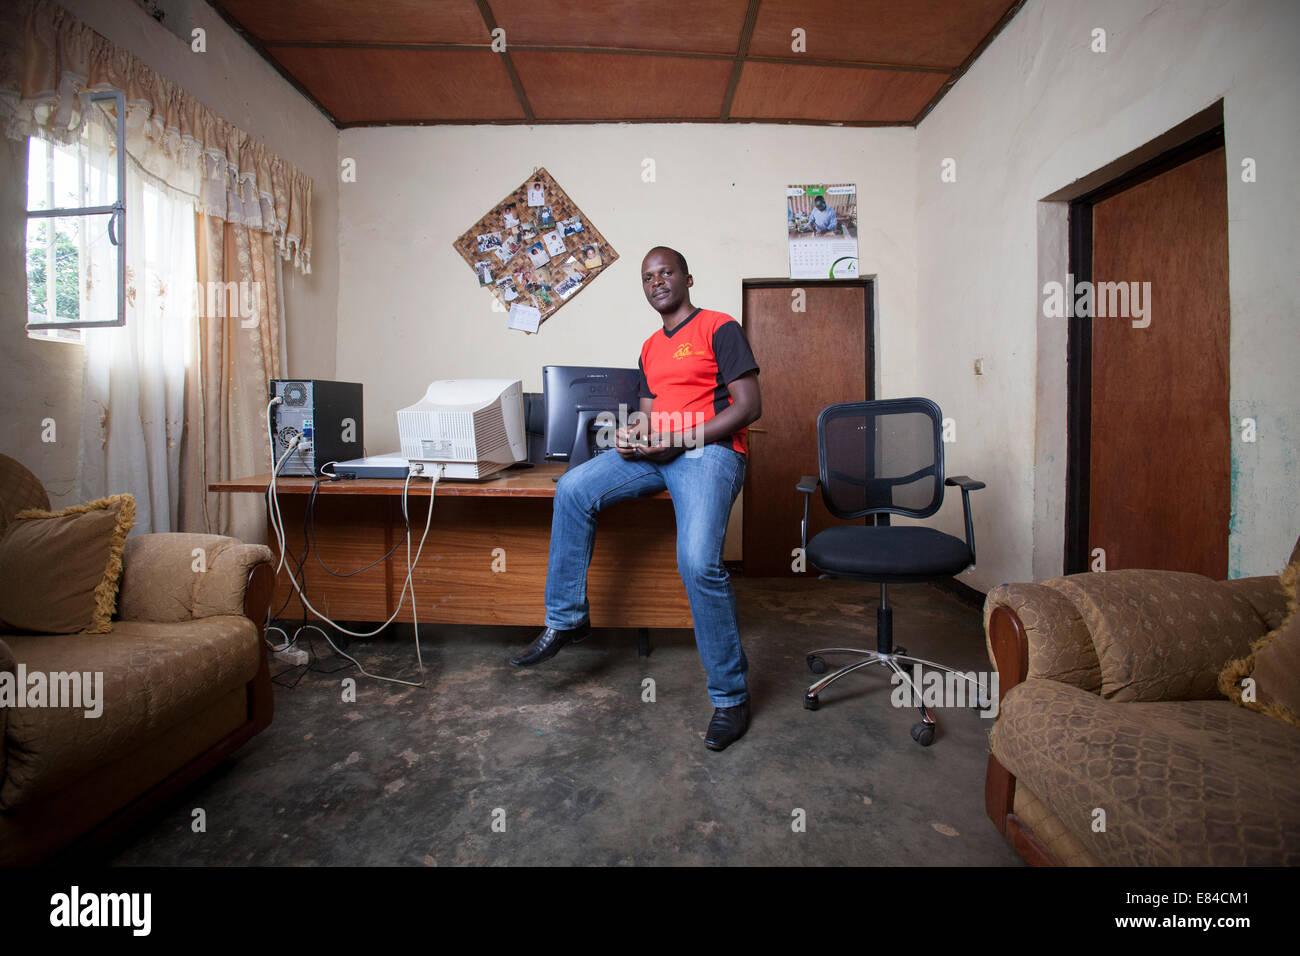 Rwandan website administrator running an online business from his home office, Kigali, Rwanda - Stock Image